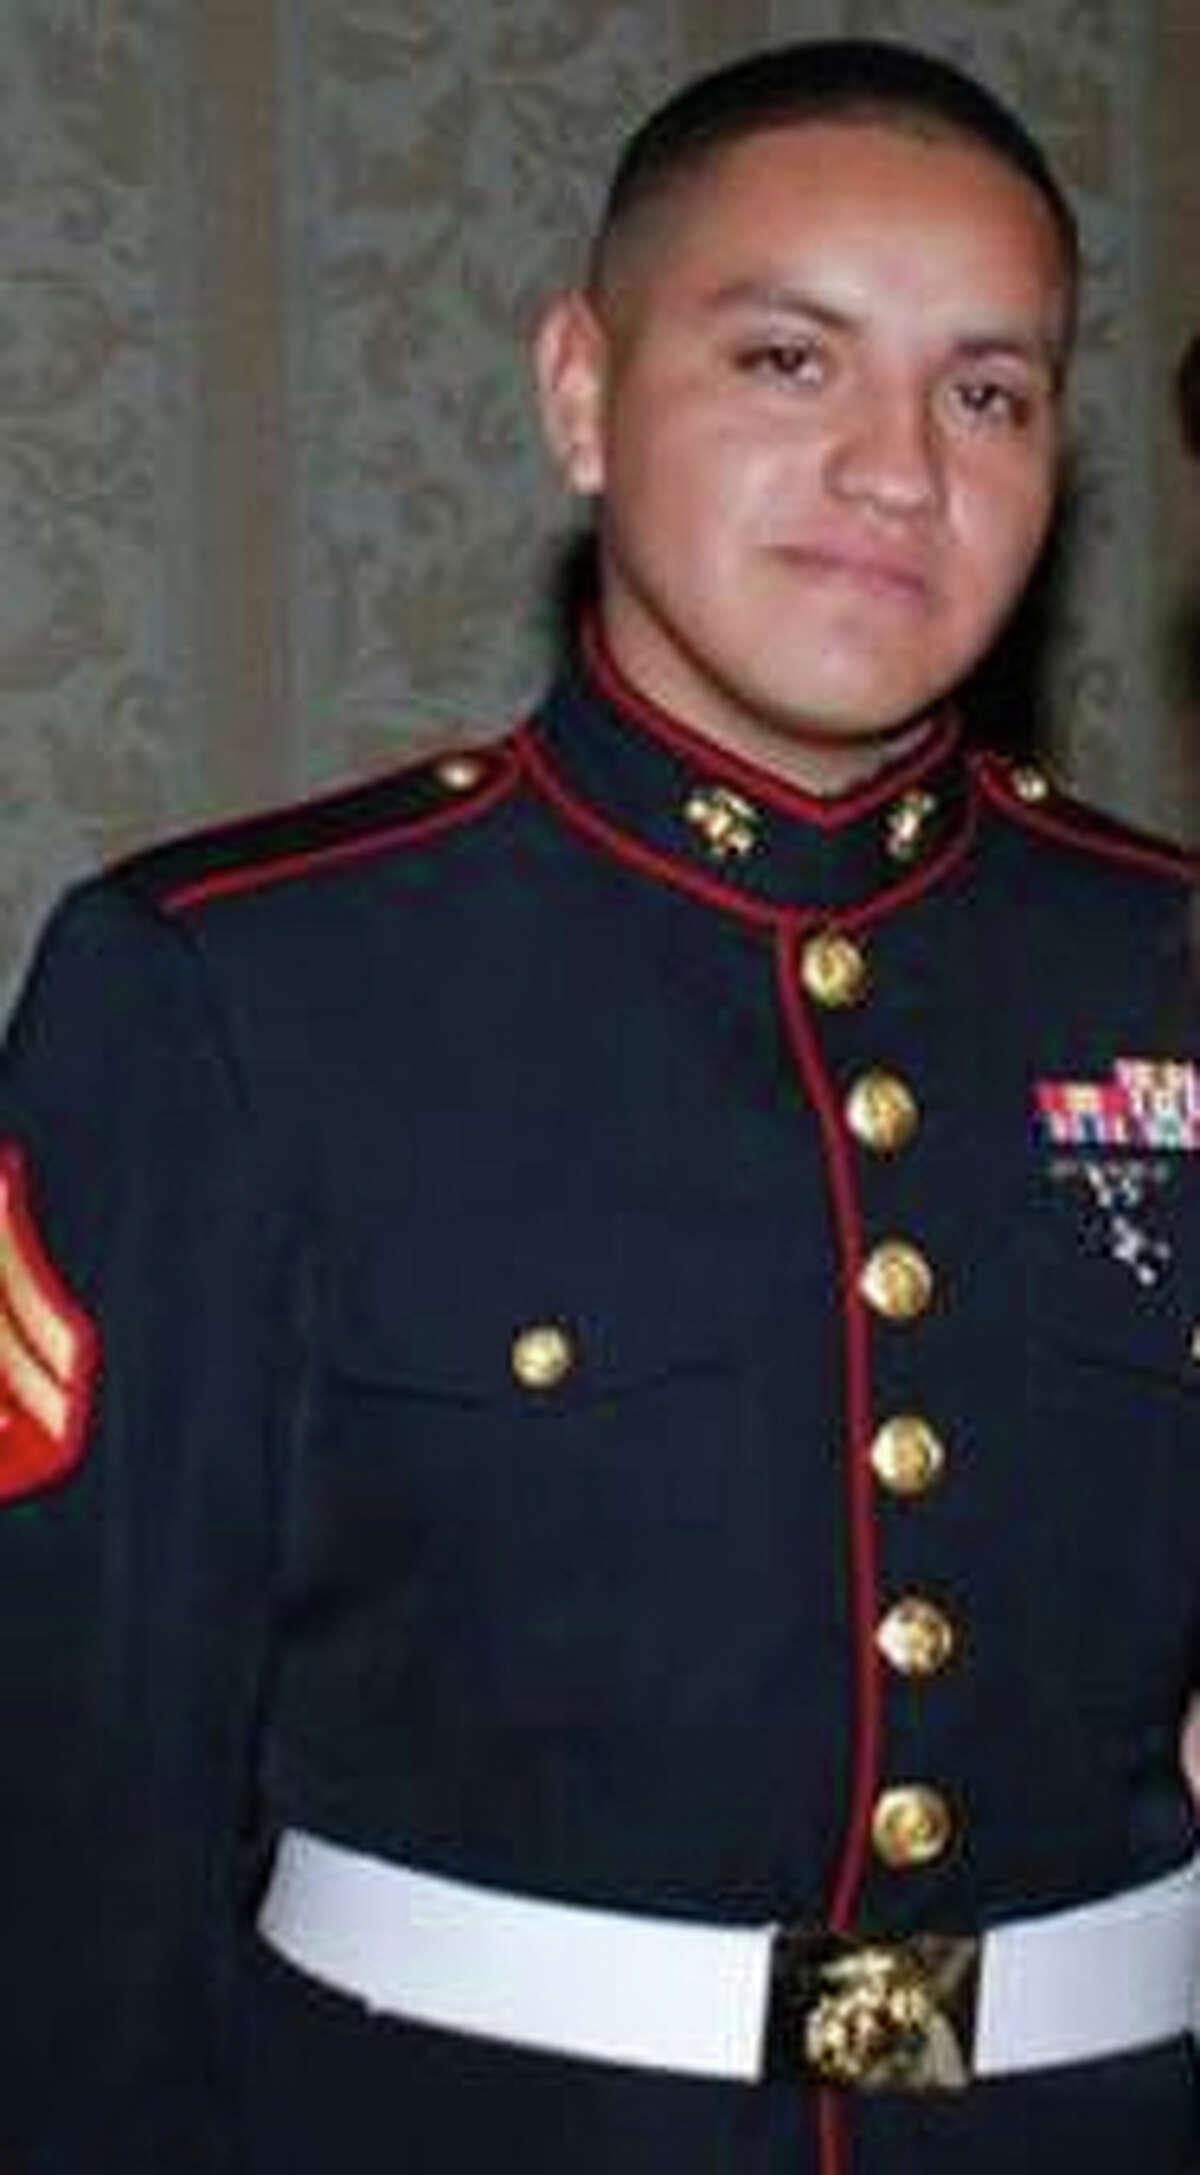 Iraq war veteran Armando Torres III was abducted in Tamaulipas in May.